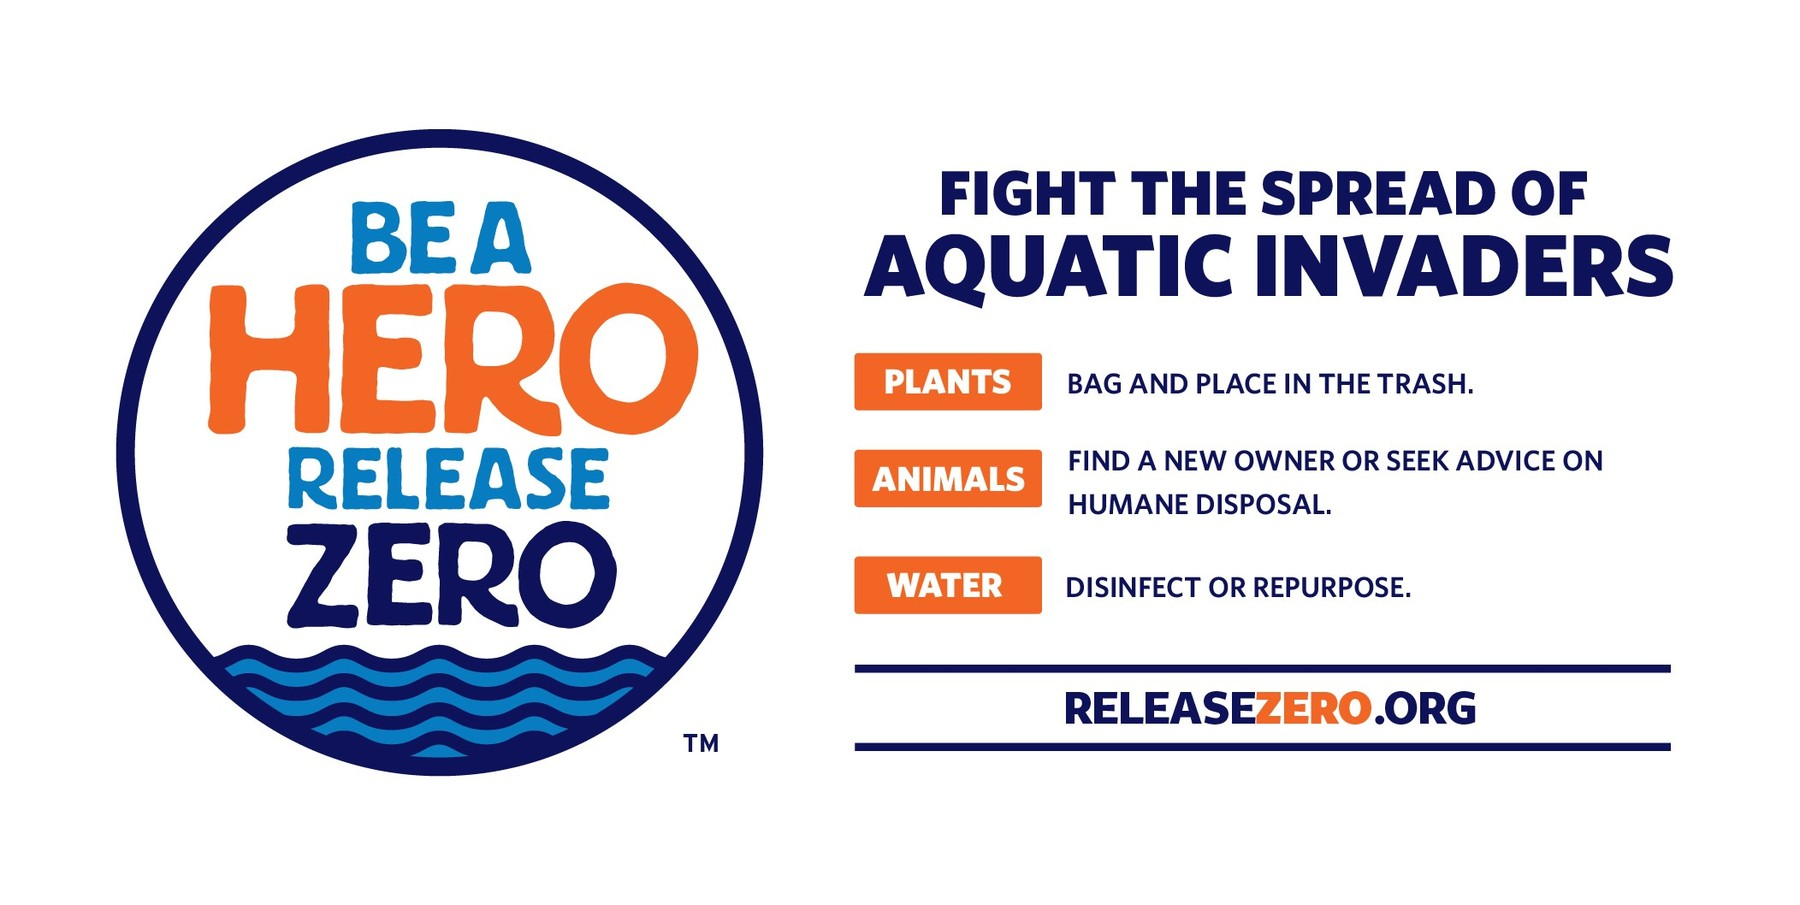 Be A Hero: Release Zero